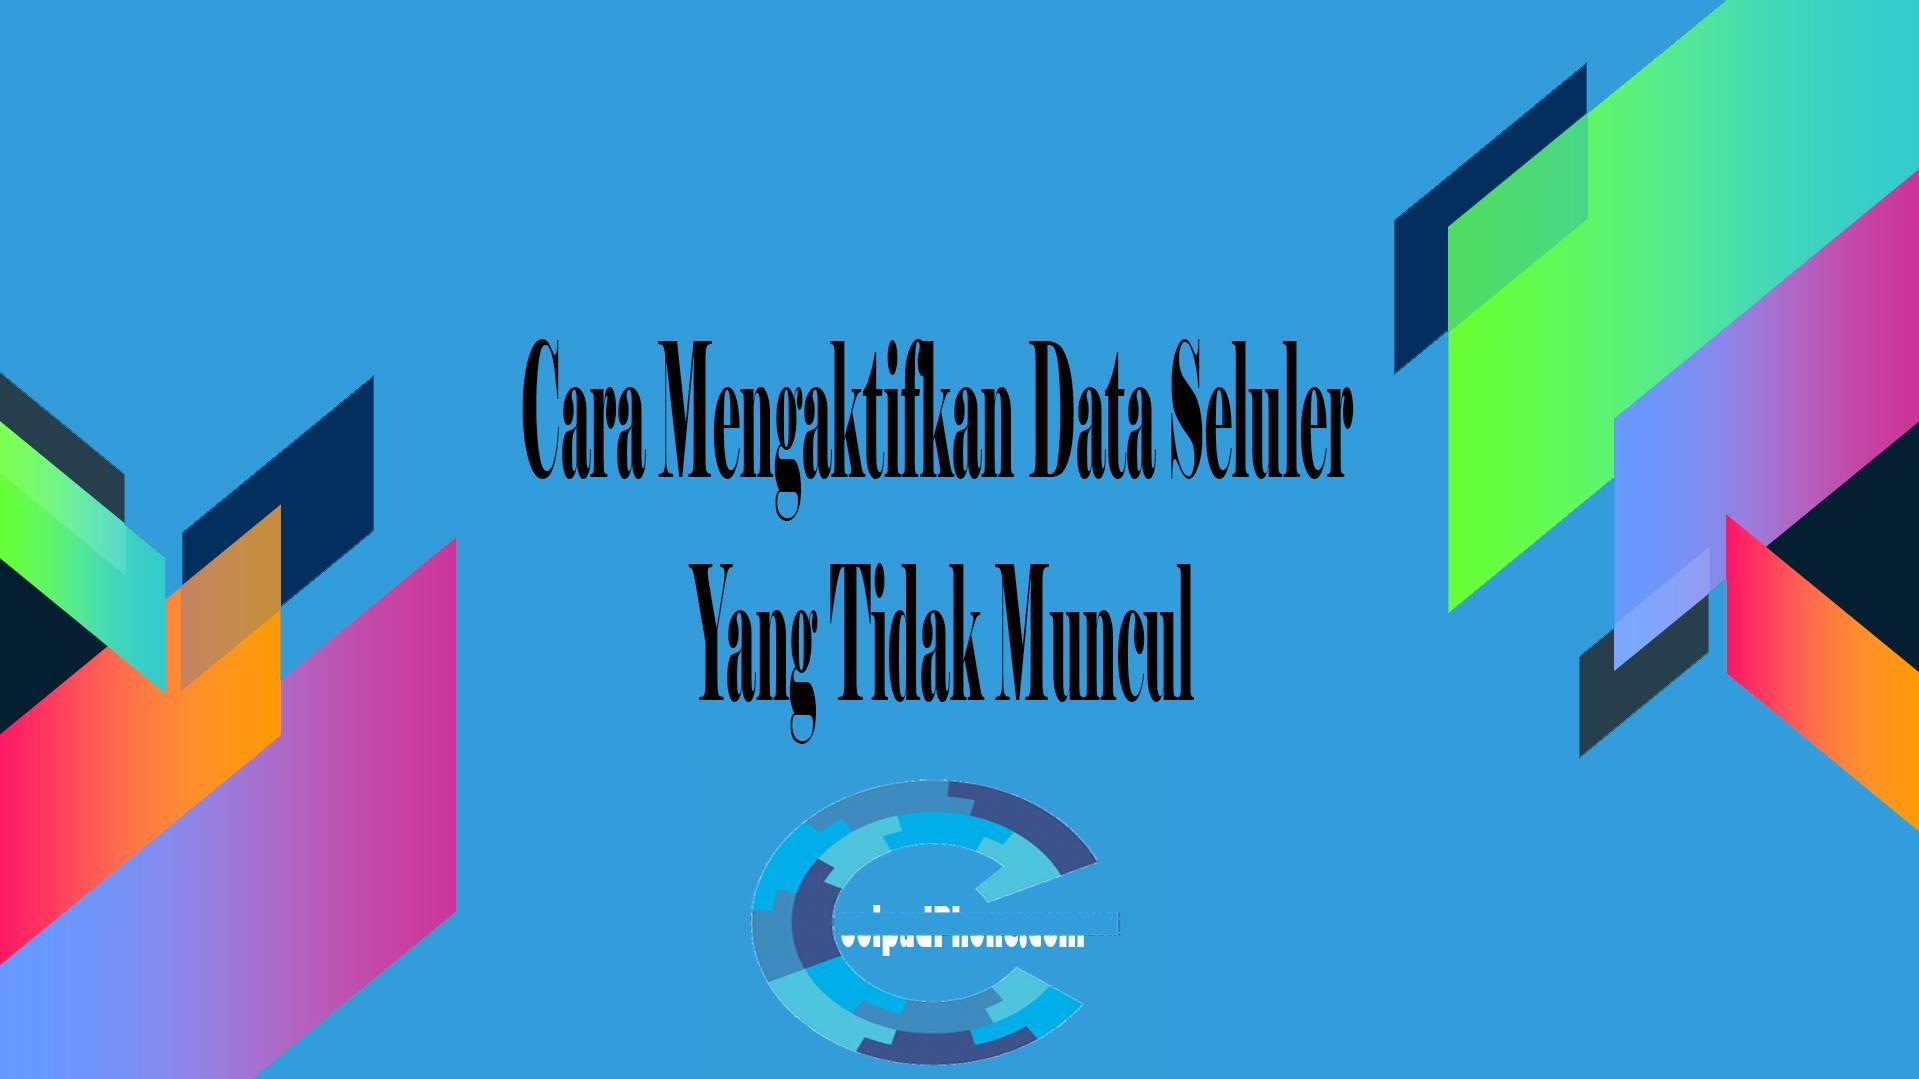 Cara Mengaktifkan Data Seluler Yang Tidak Muncul